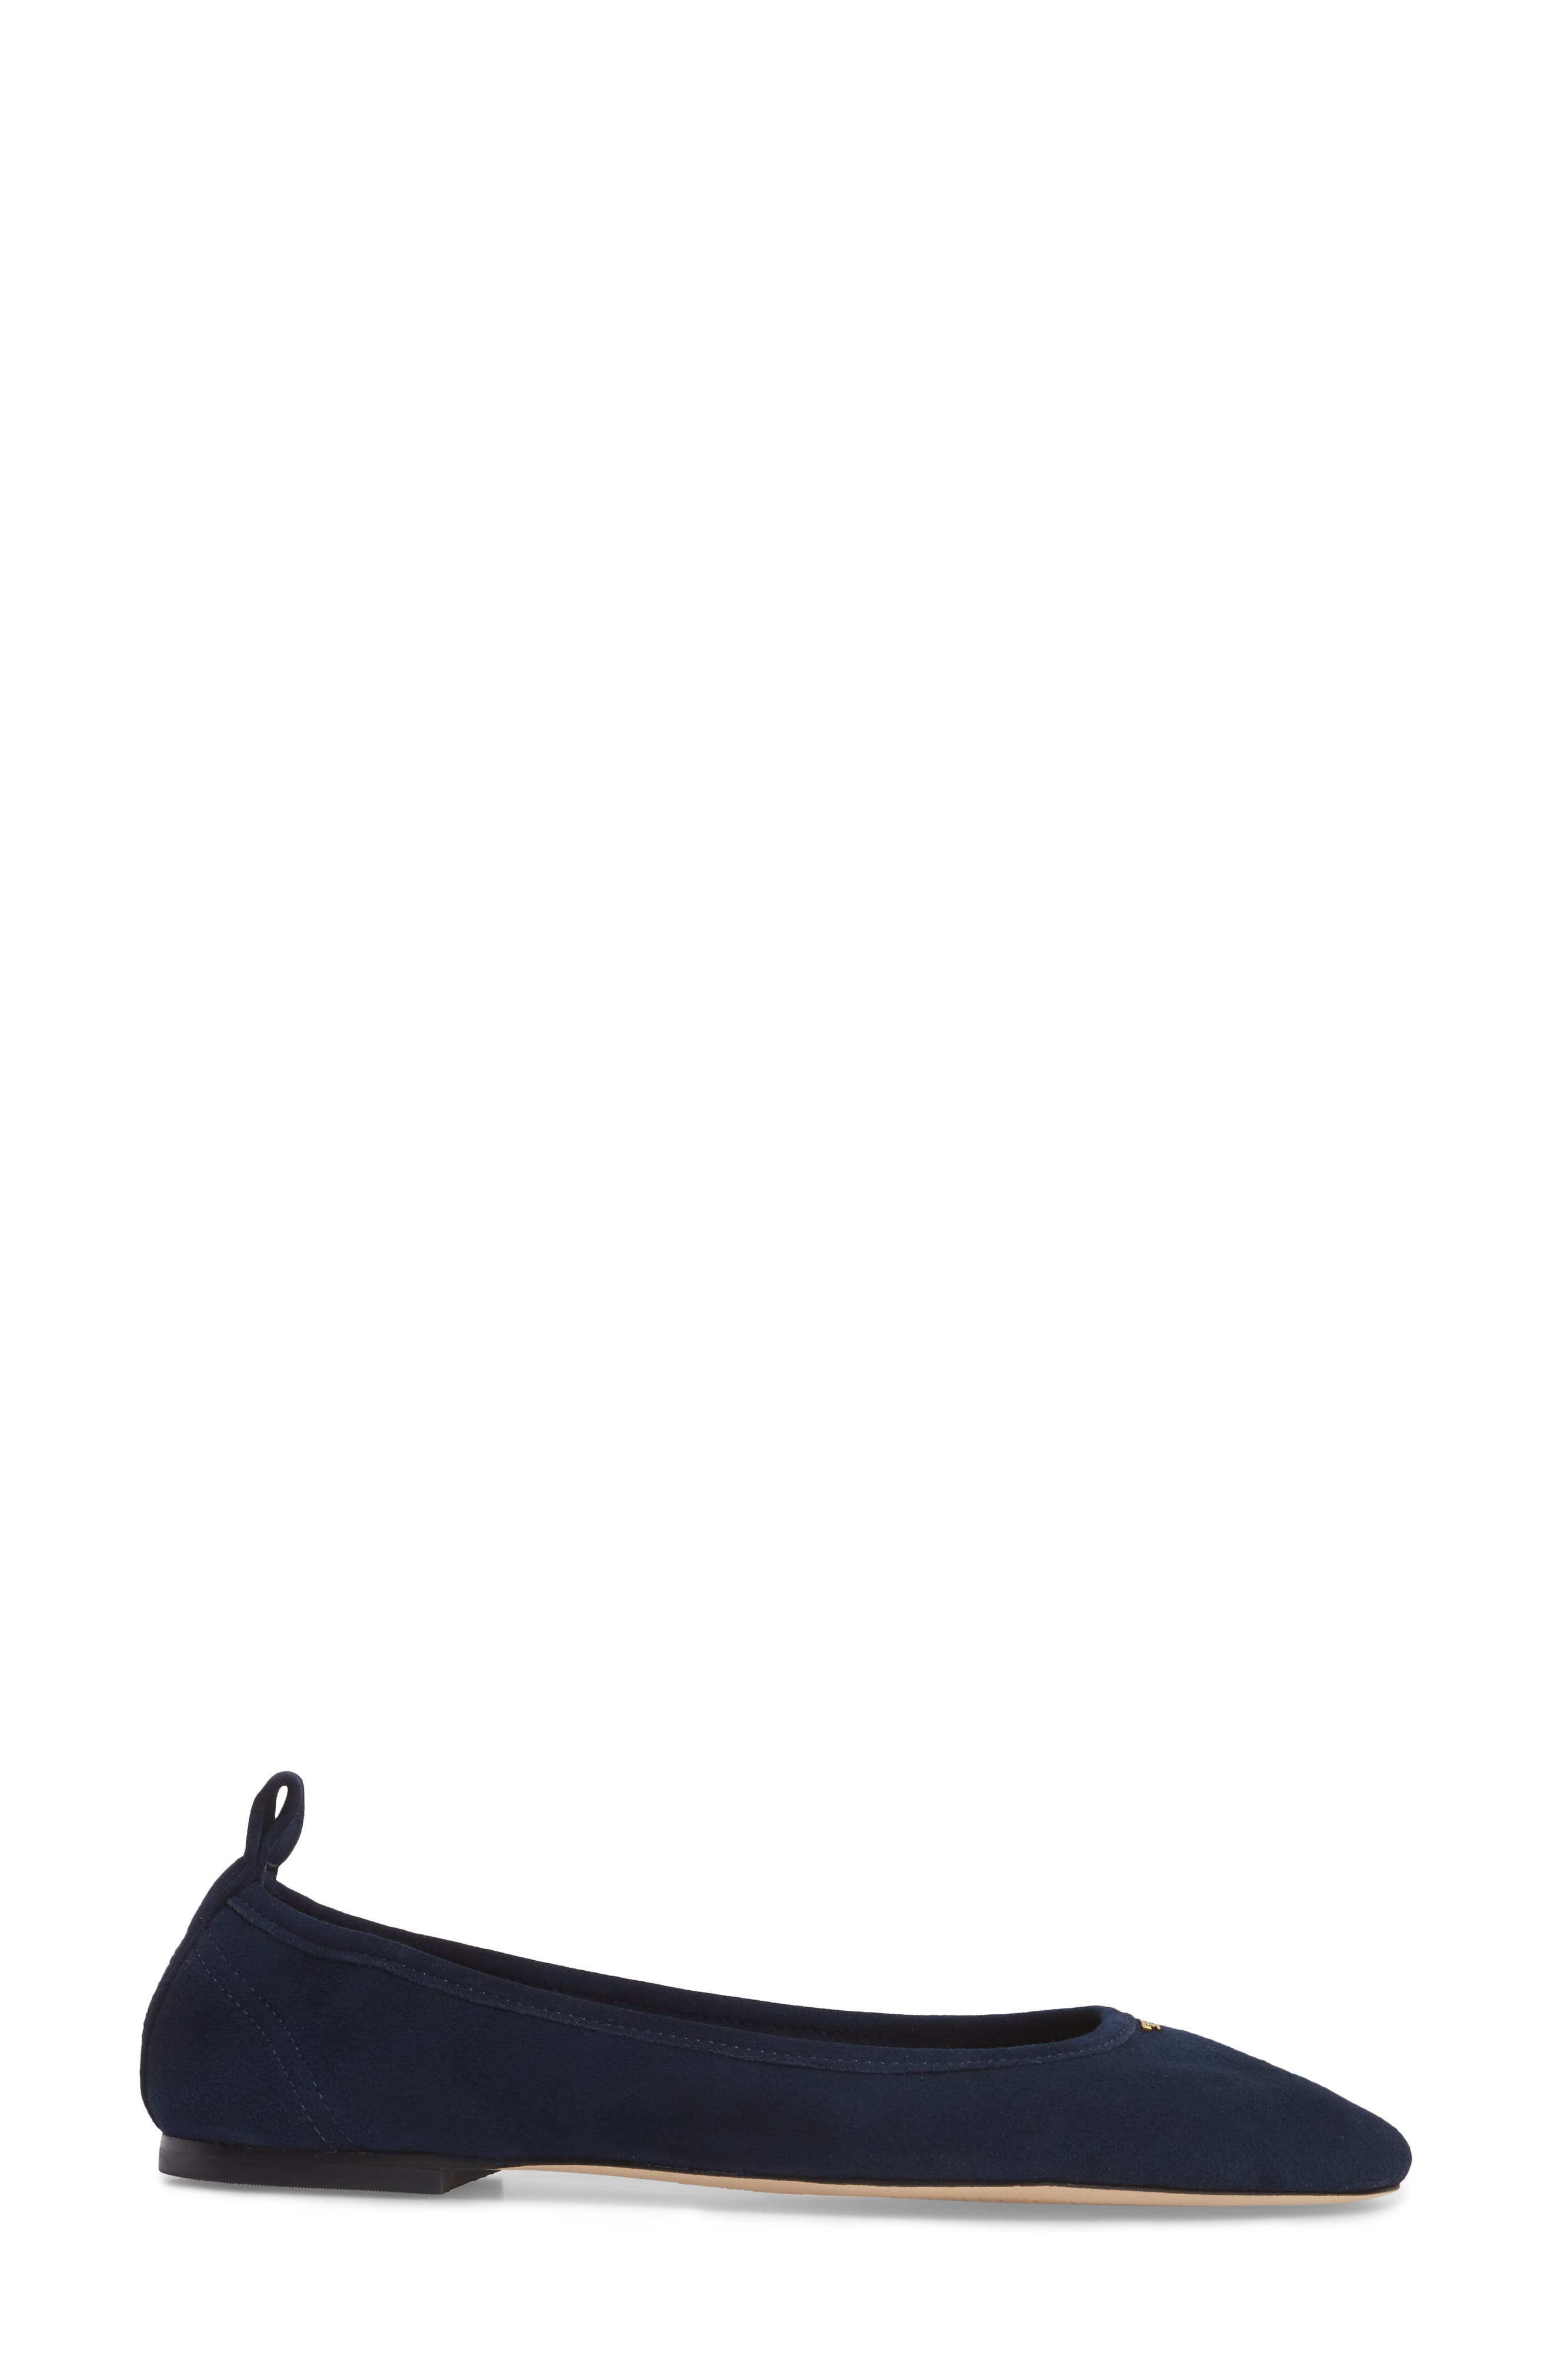 Therese Ballet Flat,                             Alternate thumbnail 3, color,                             Royal Navy